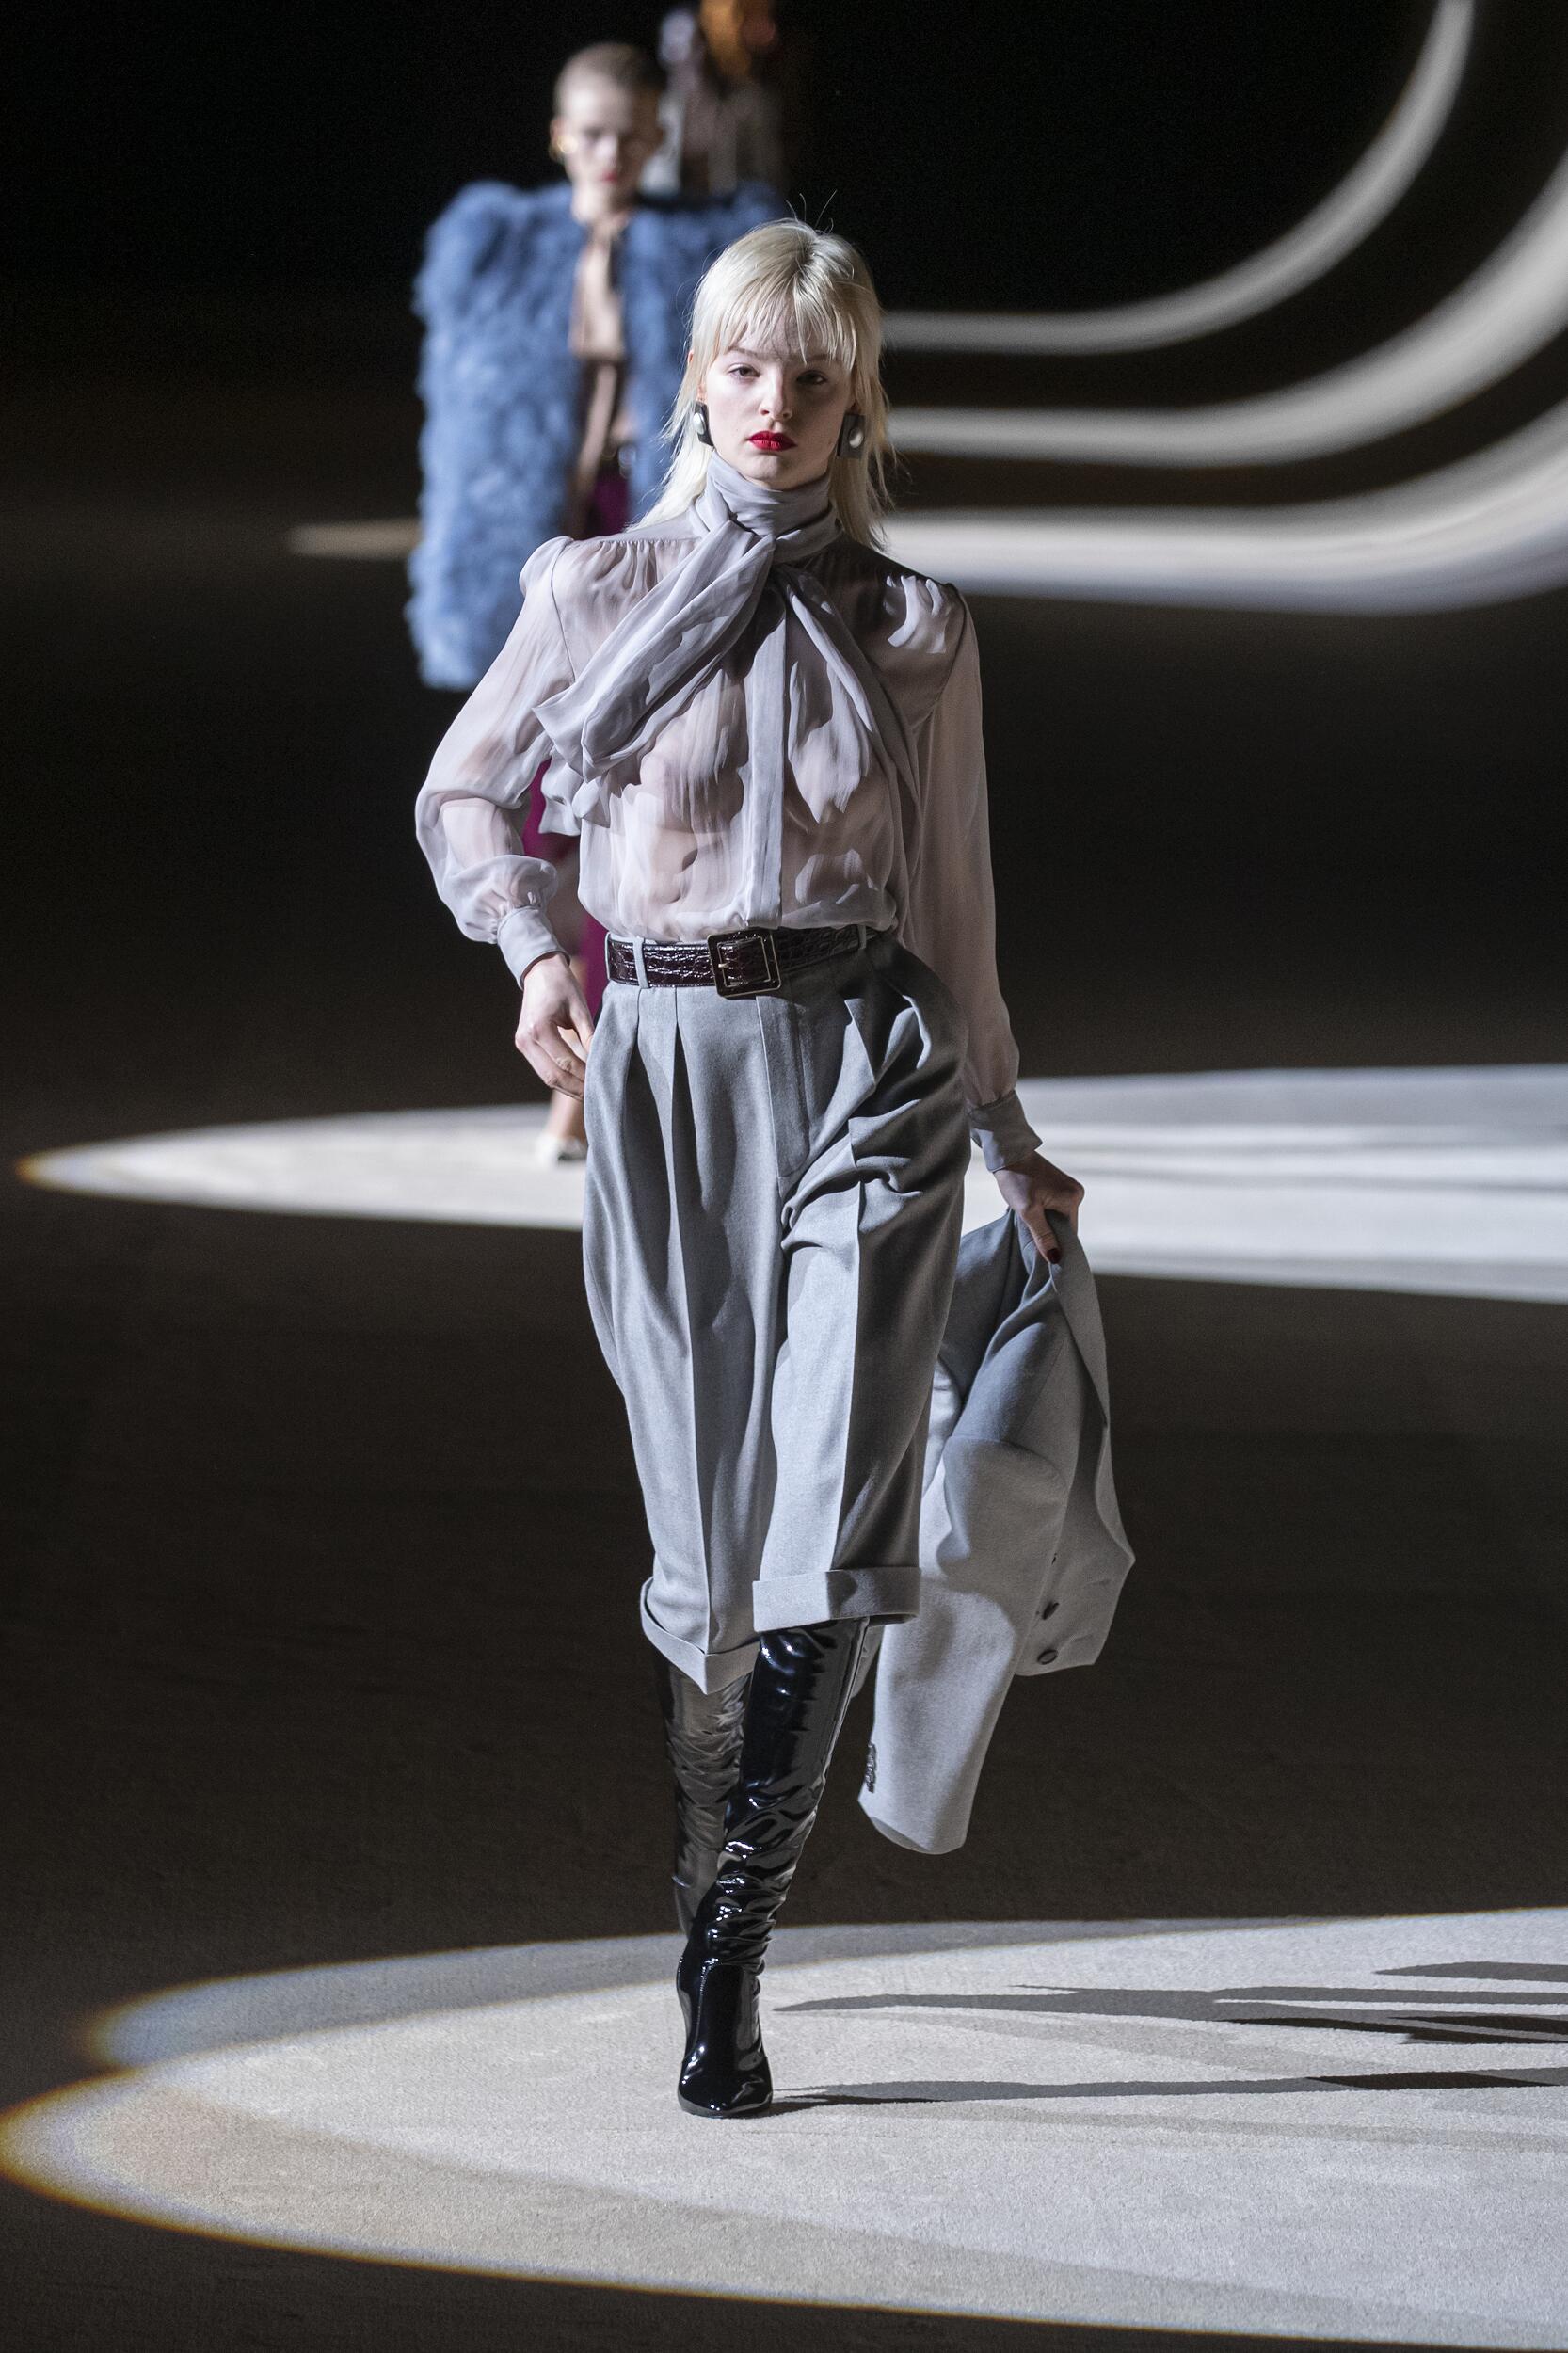 Saint Laurent FW 2020 Womenswear